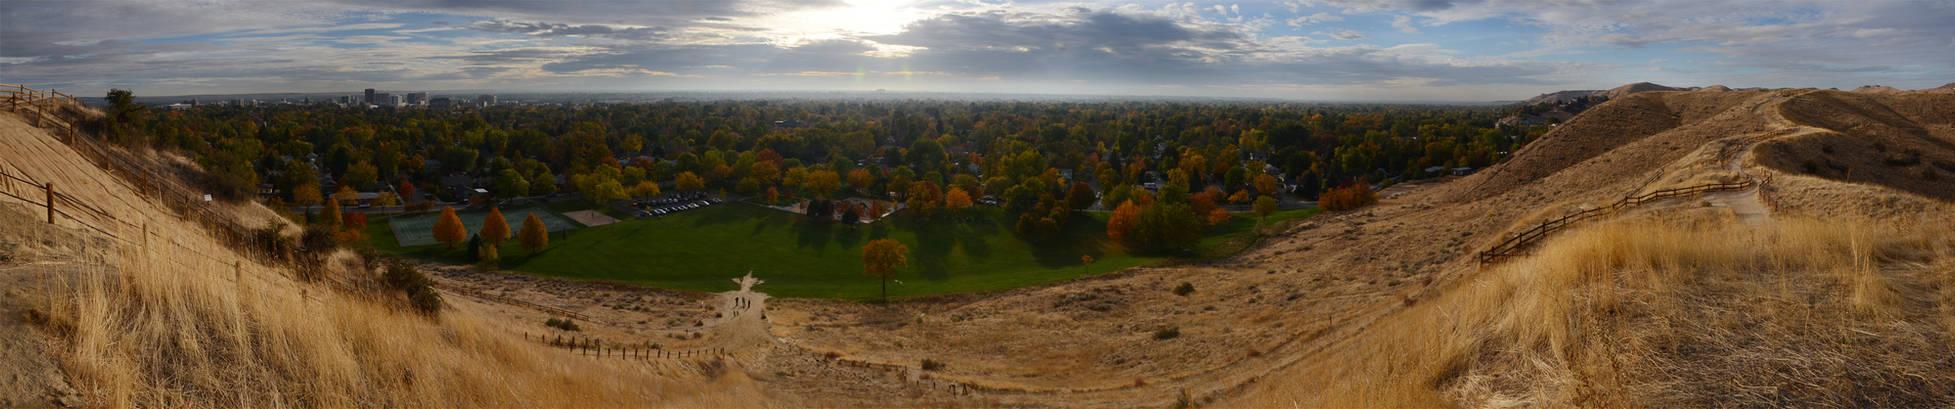 Camelback Park Fall 2012-10-19 2